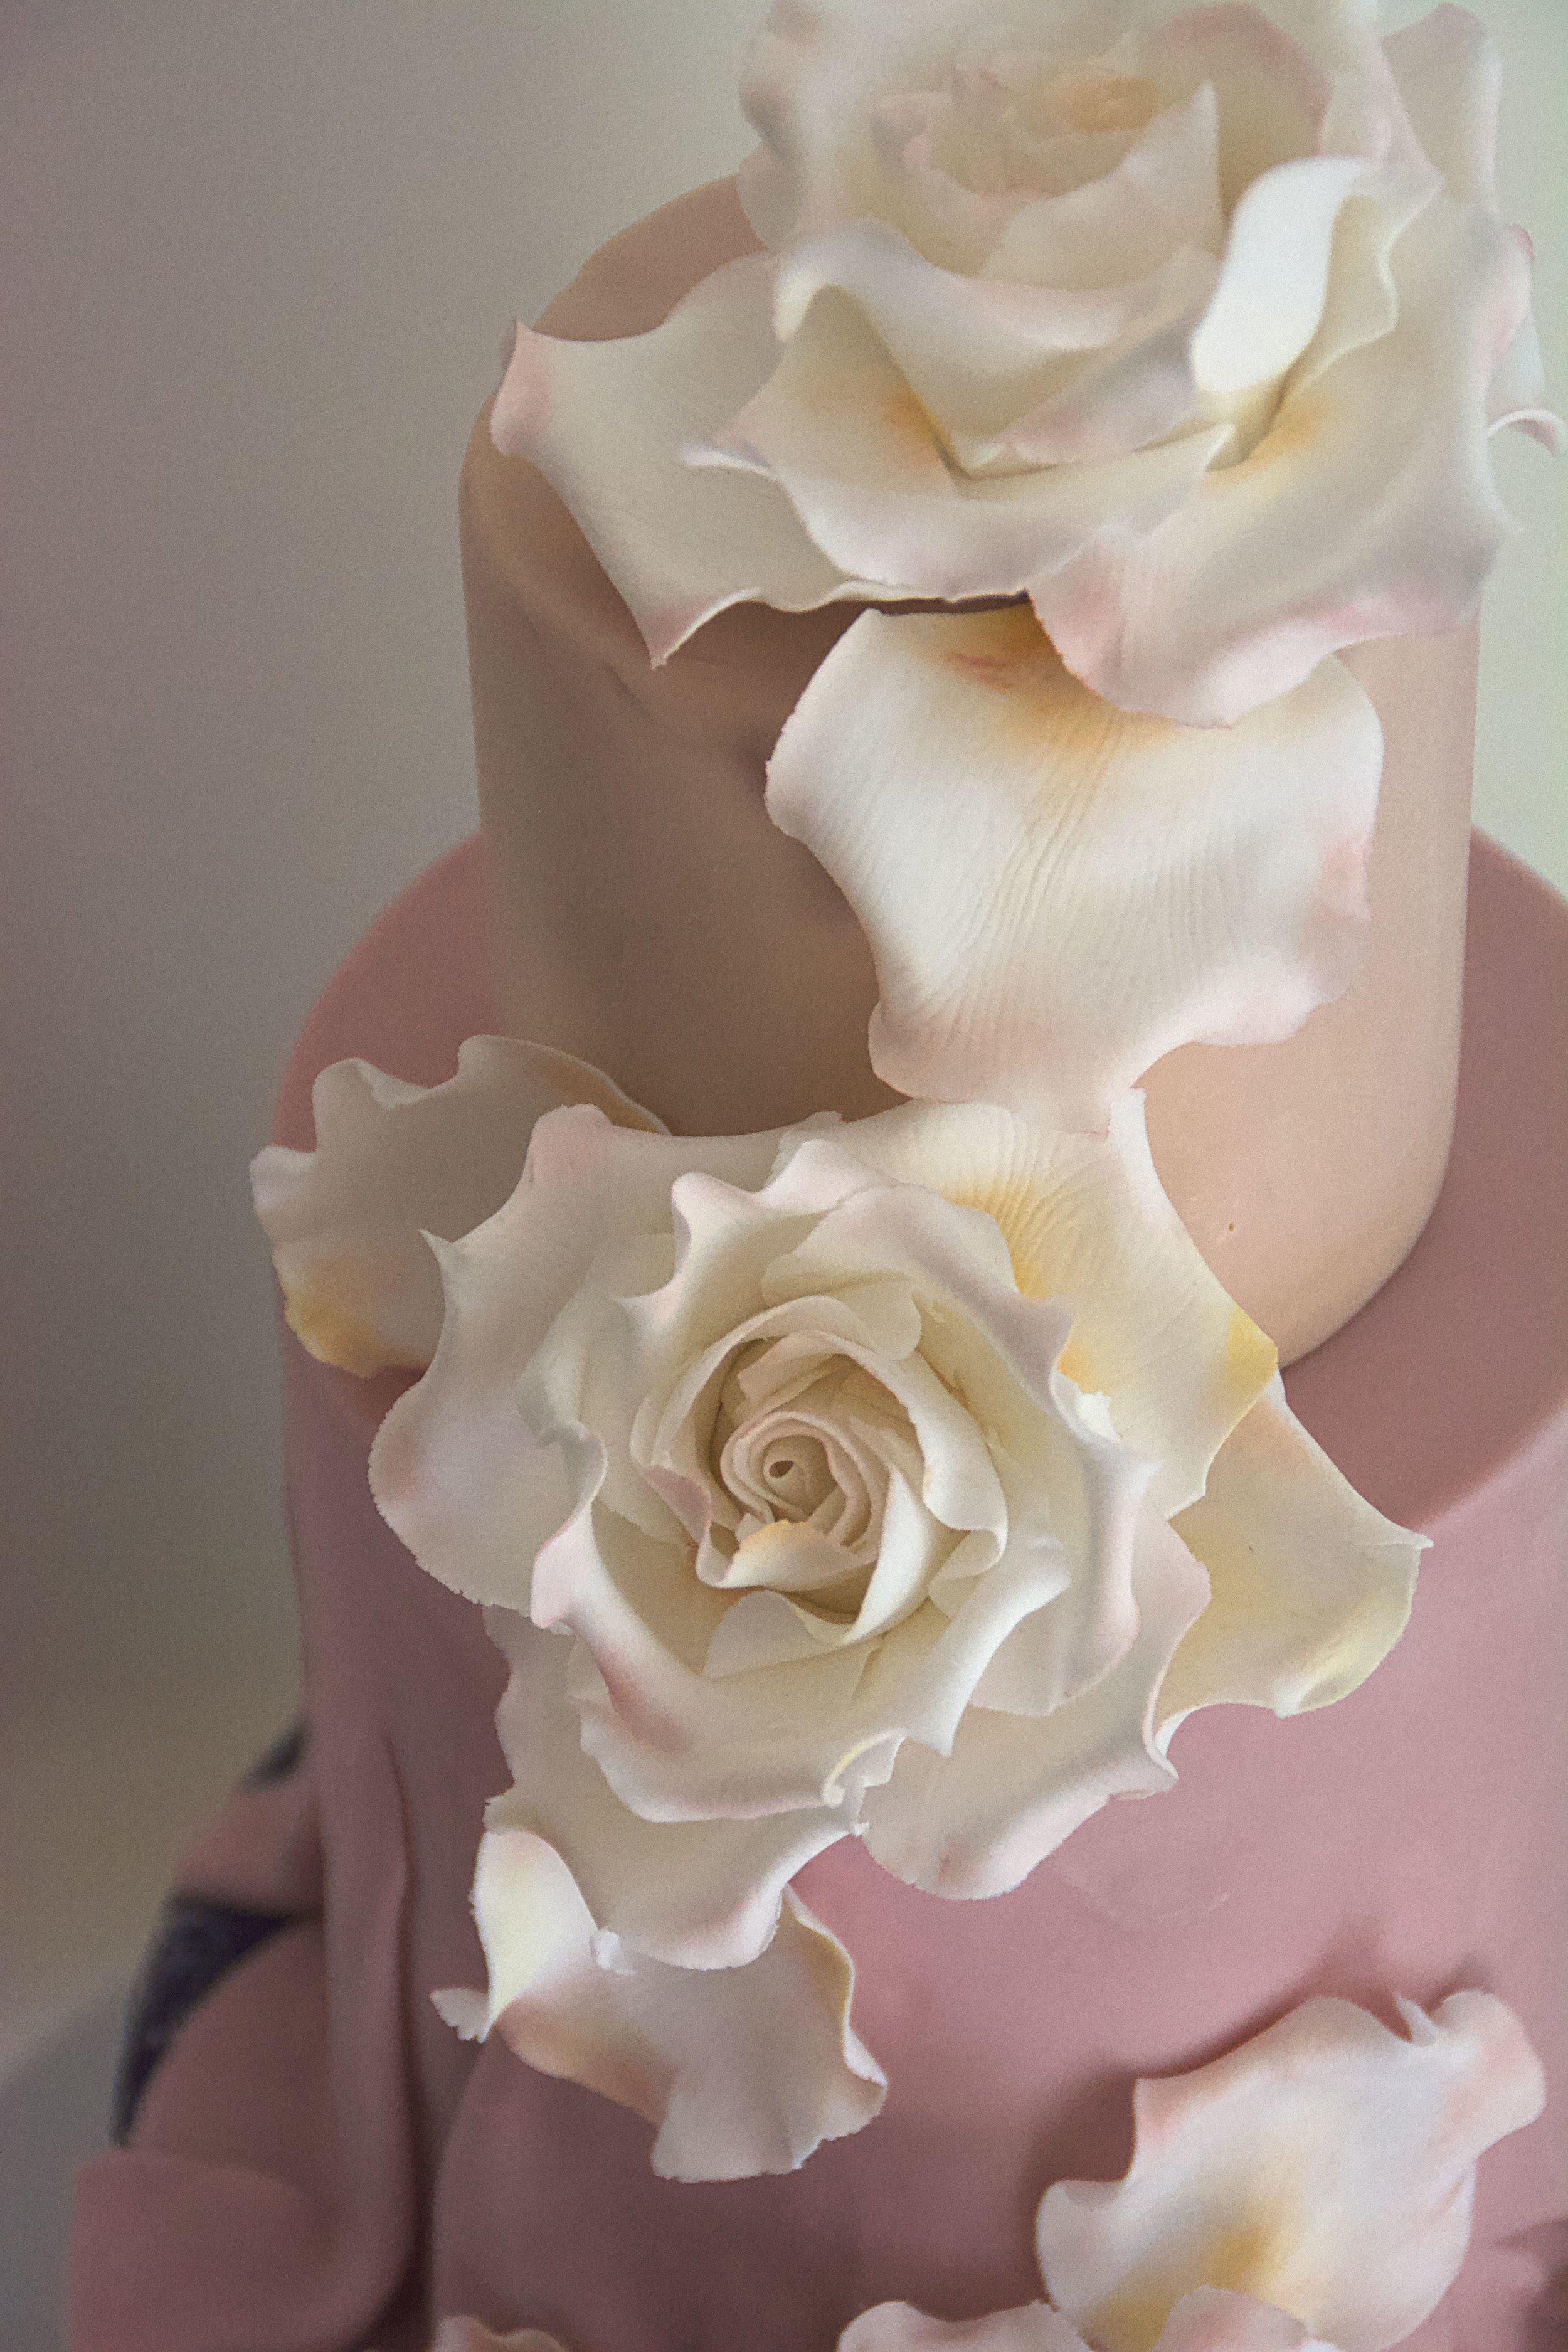 Vintage_sugar_rose_wedding_cake_details.jpg